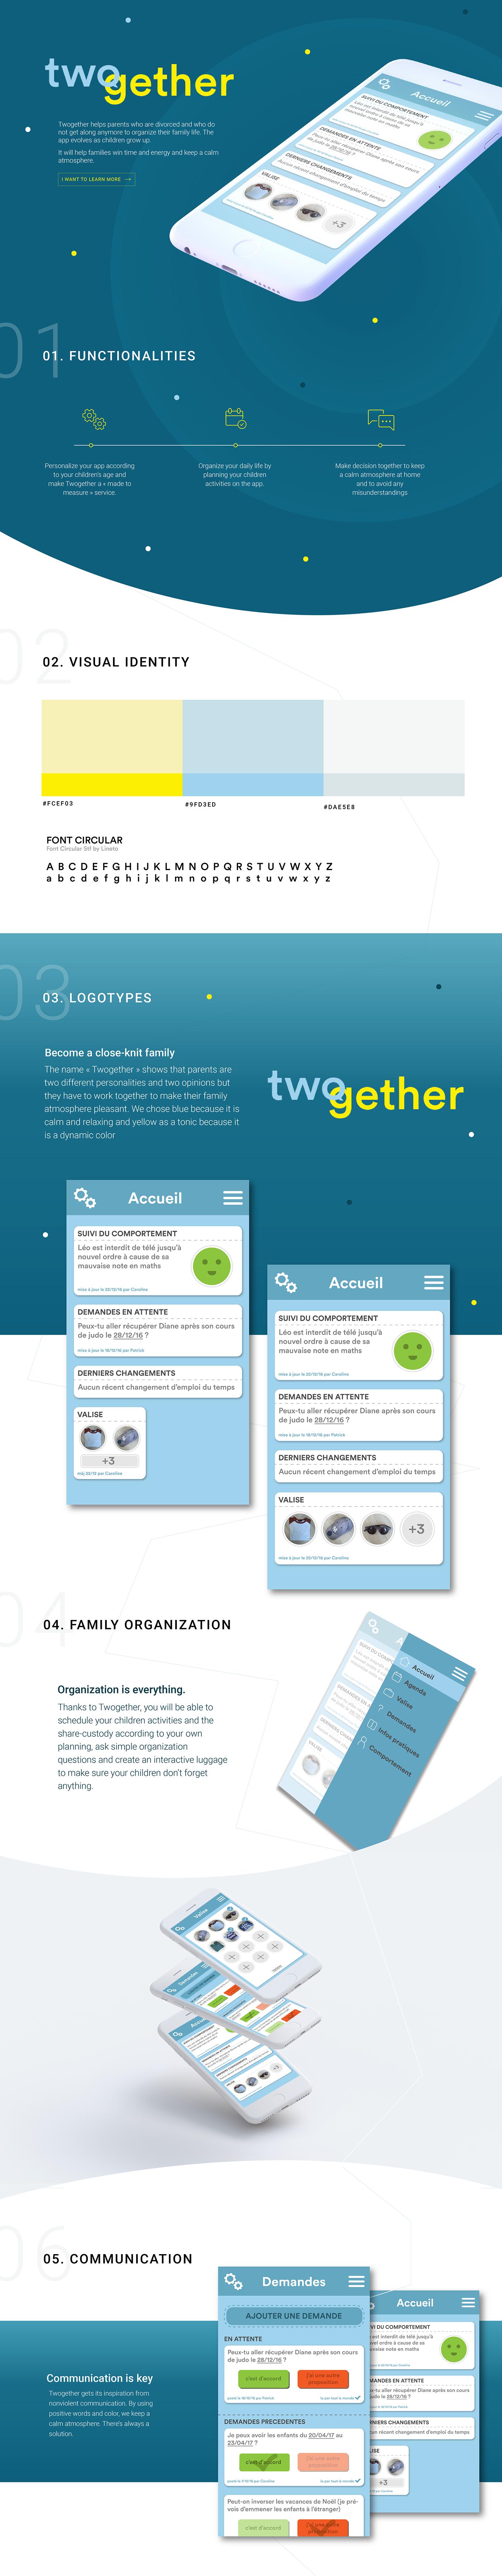 mobile design UI ux app graphism Conception material design